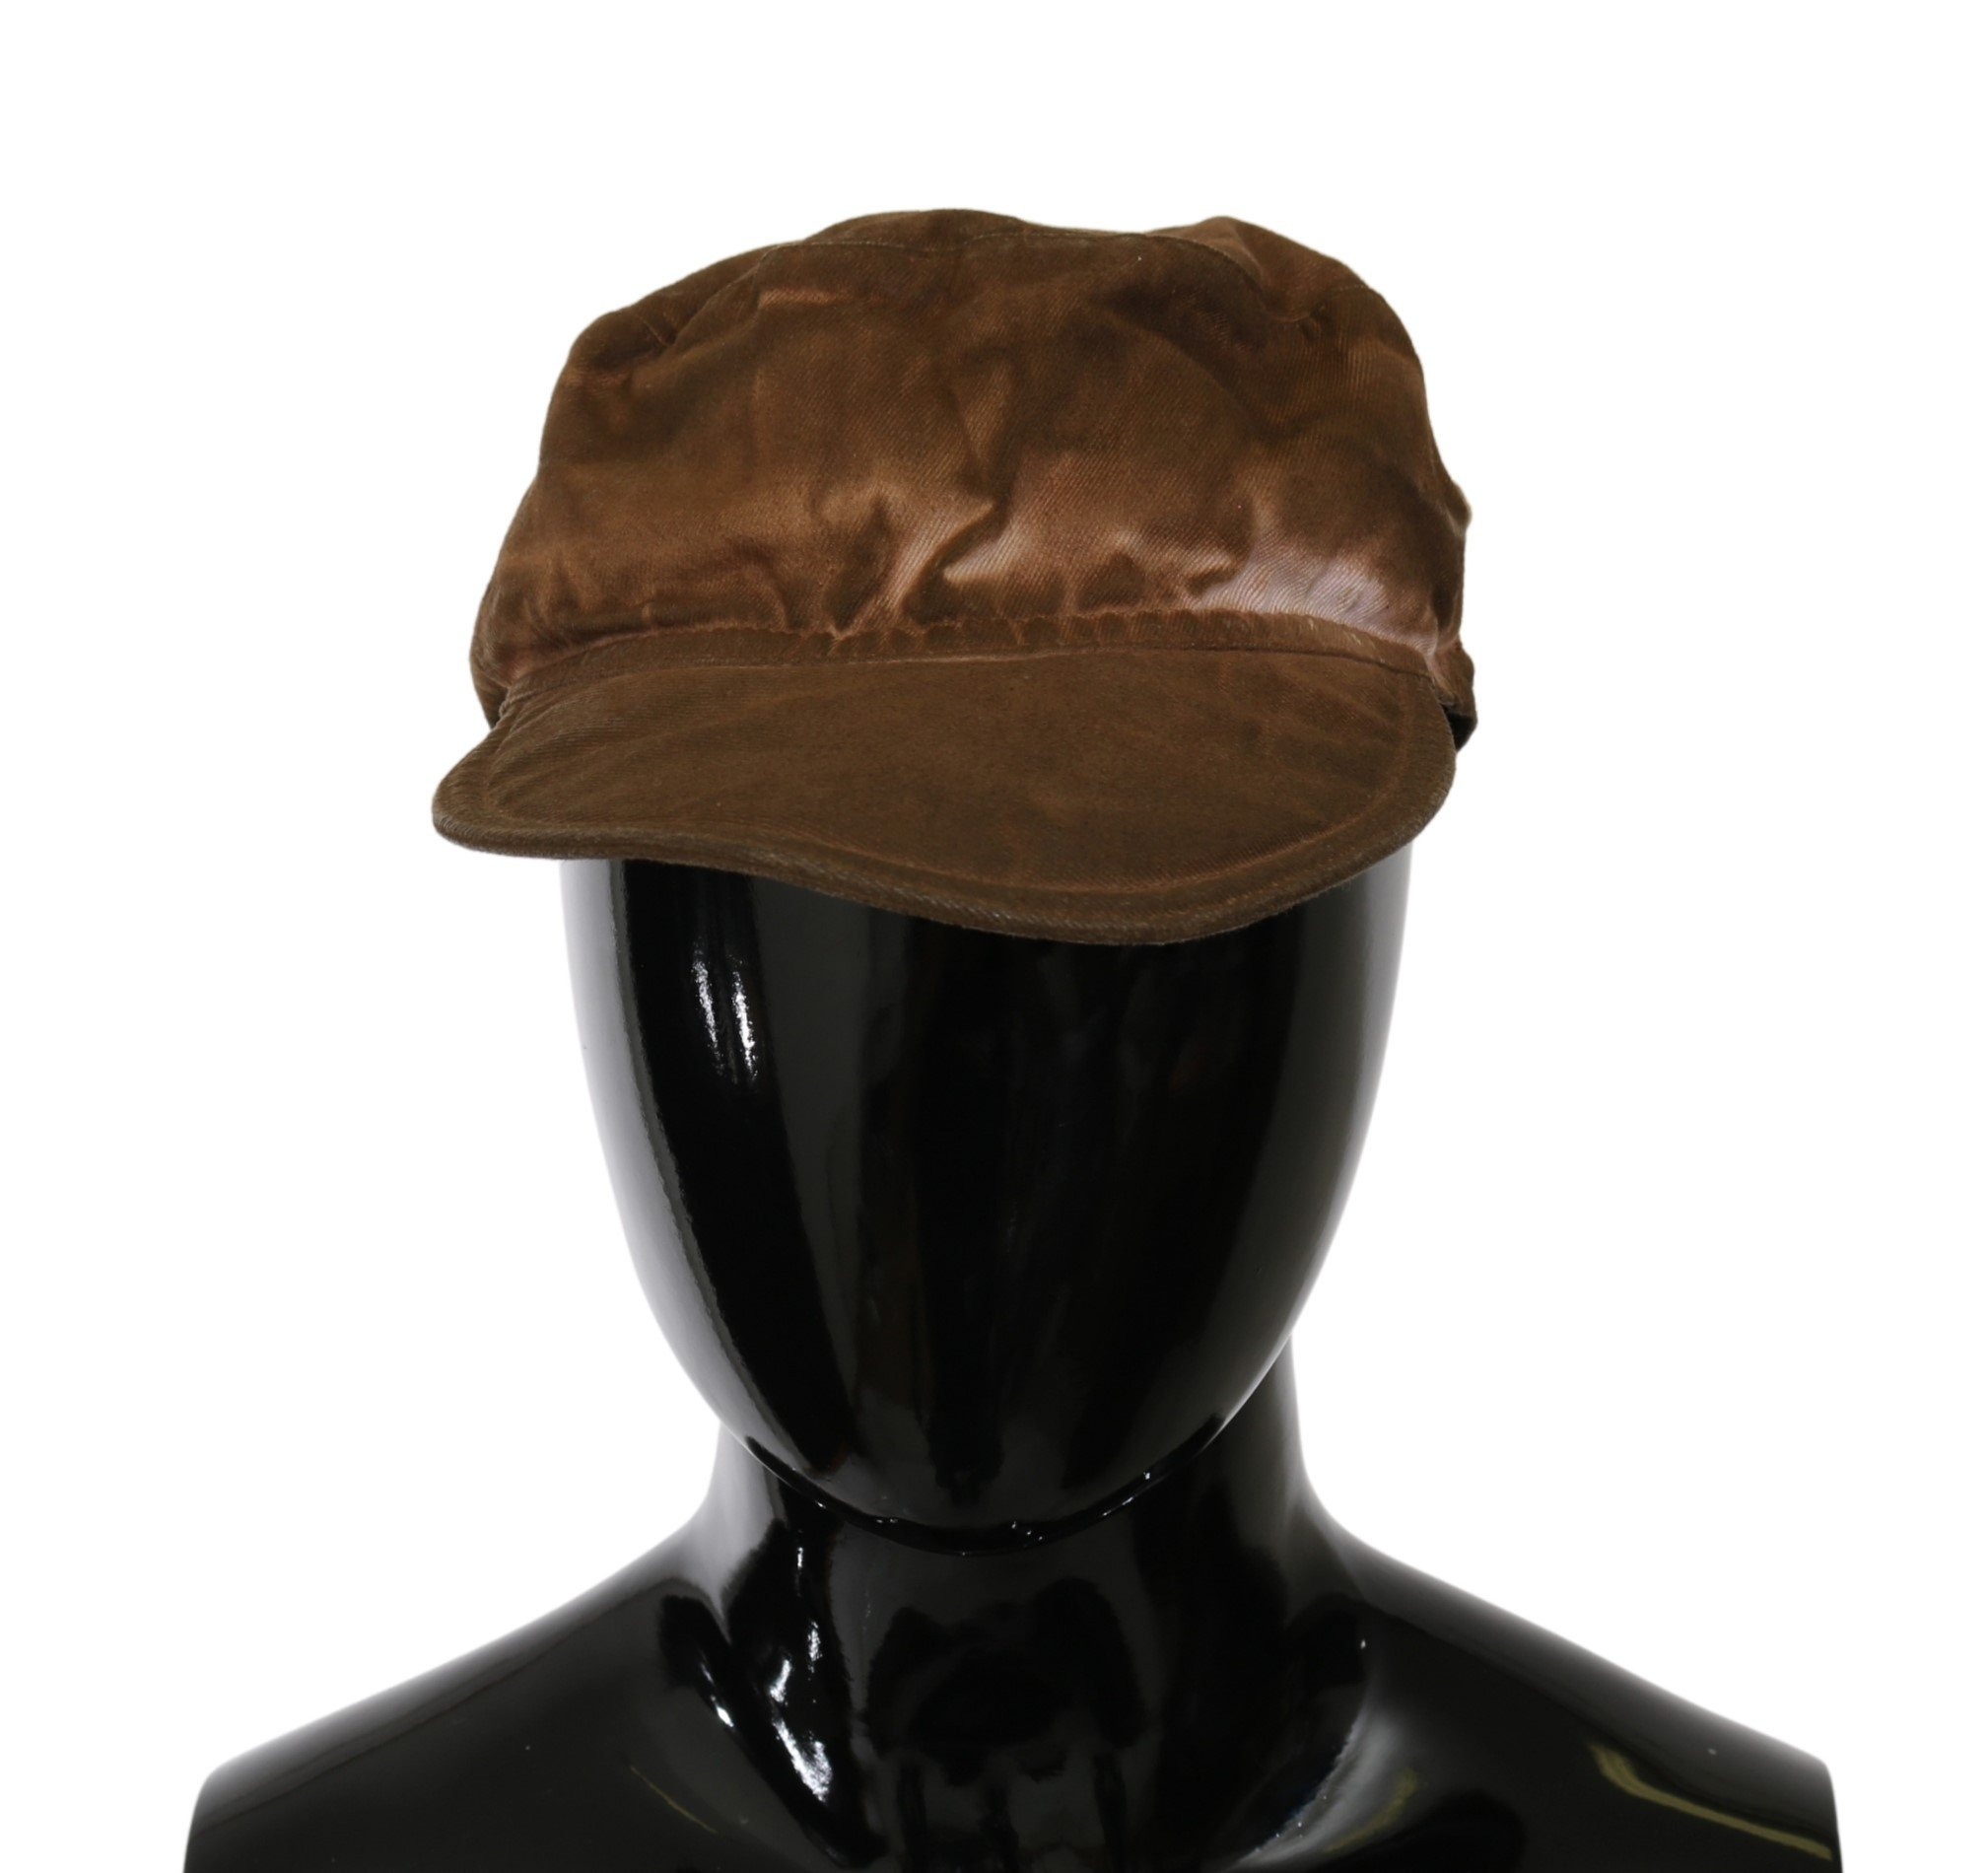 Costume National Women's Newsboy Beret Cabbie Hat Brown HAT20002BG - 57 cm|S